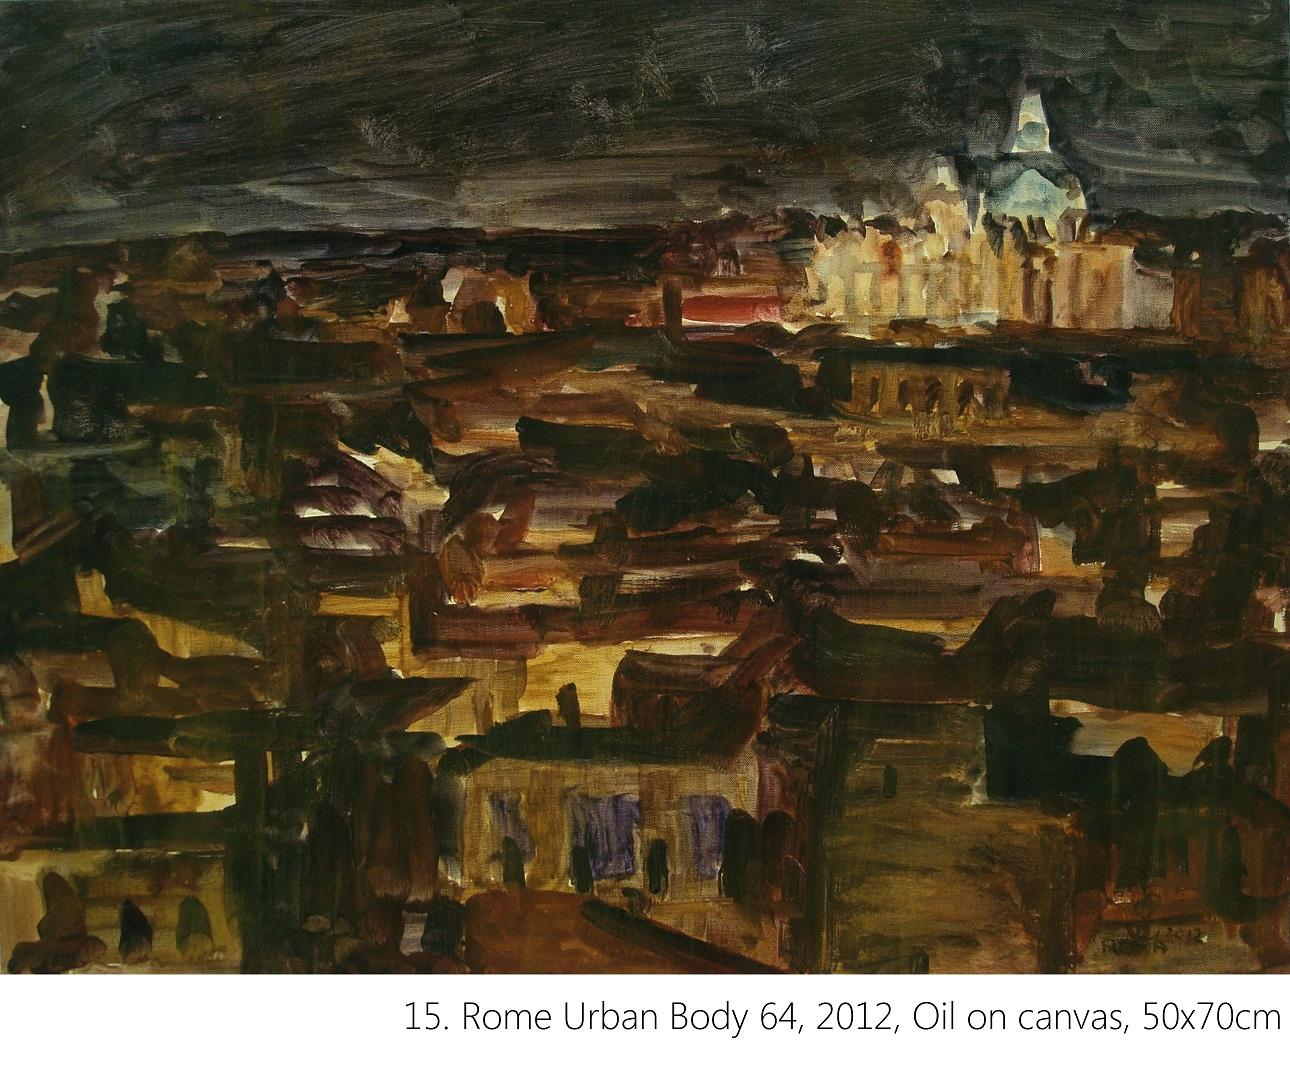 15. Rome Urban Body 64, 2012, Oil on canvas, 50x70cm